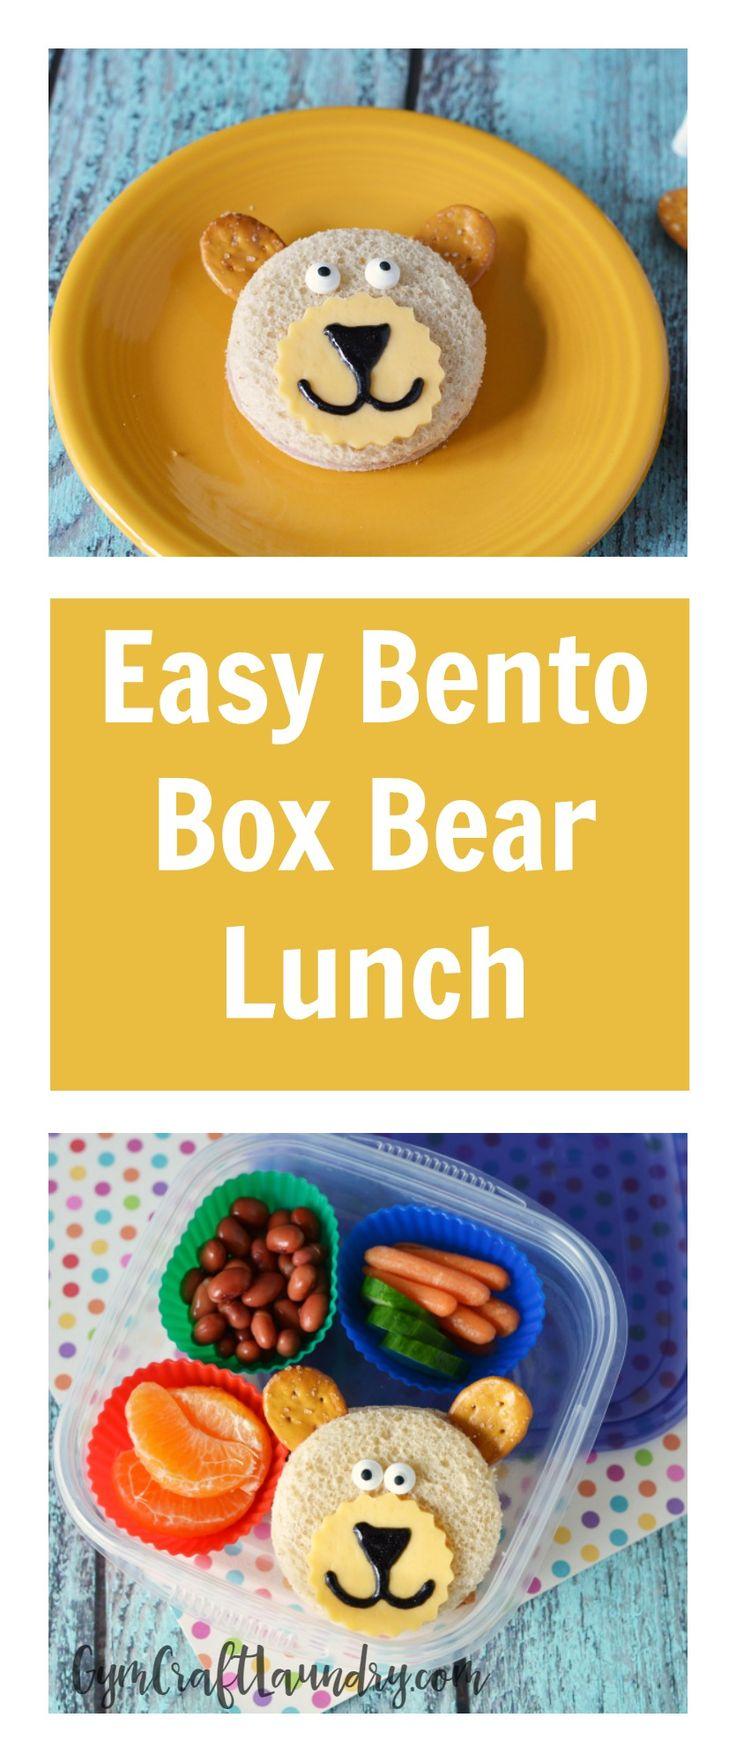 Healthy School Lunch: Bento Box Bear